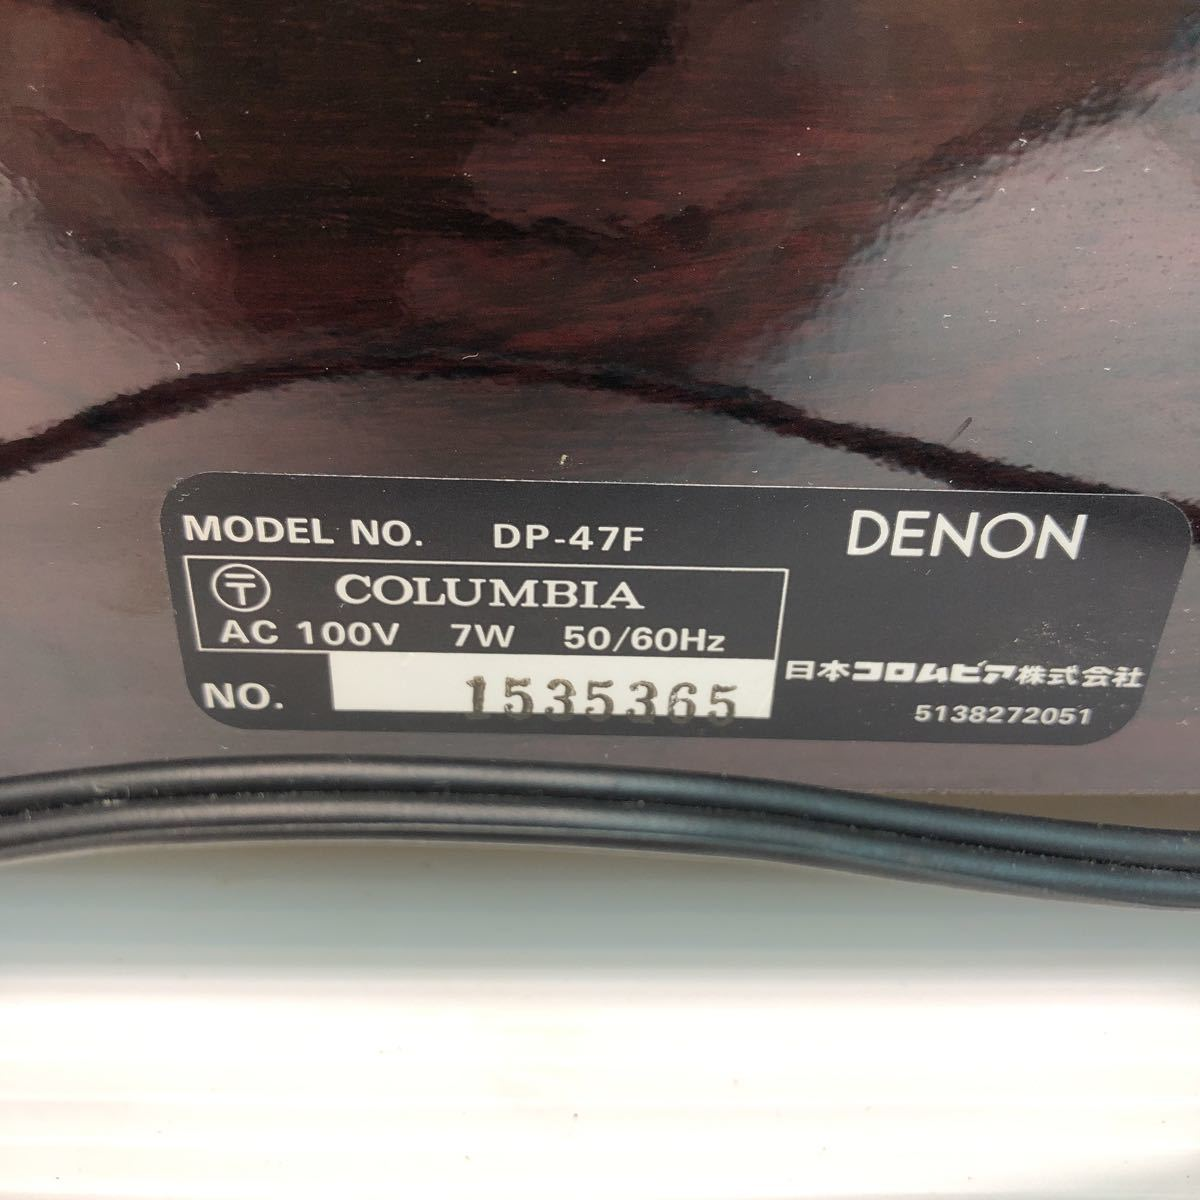 DENON デノン レコードプレーヤー DP-47F 通電のみ確認 ジャンク 1円スタート_画像9